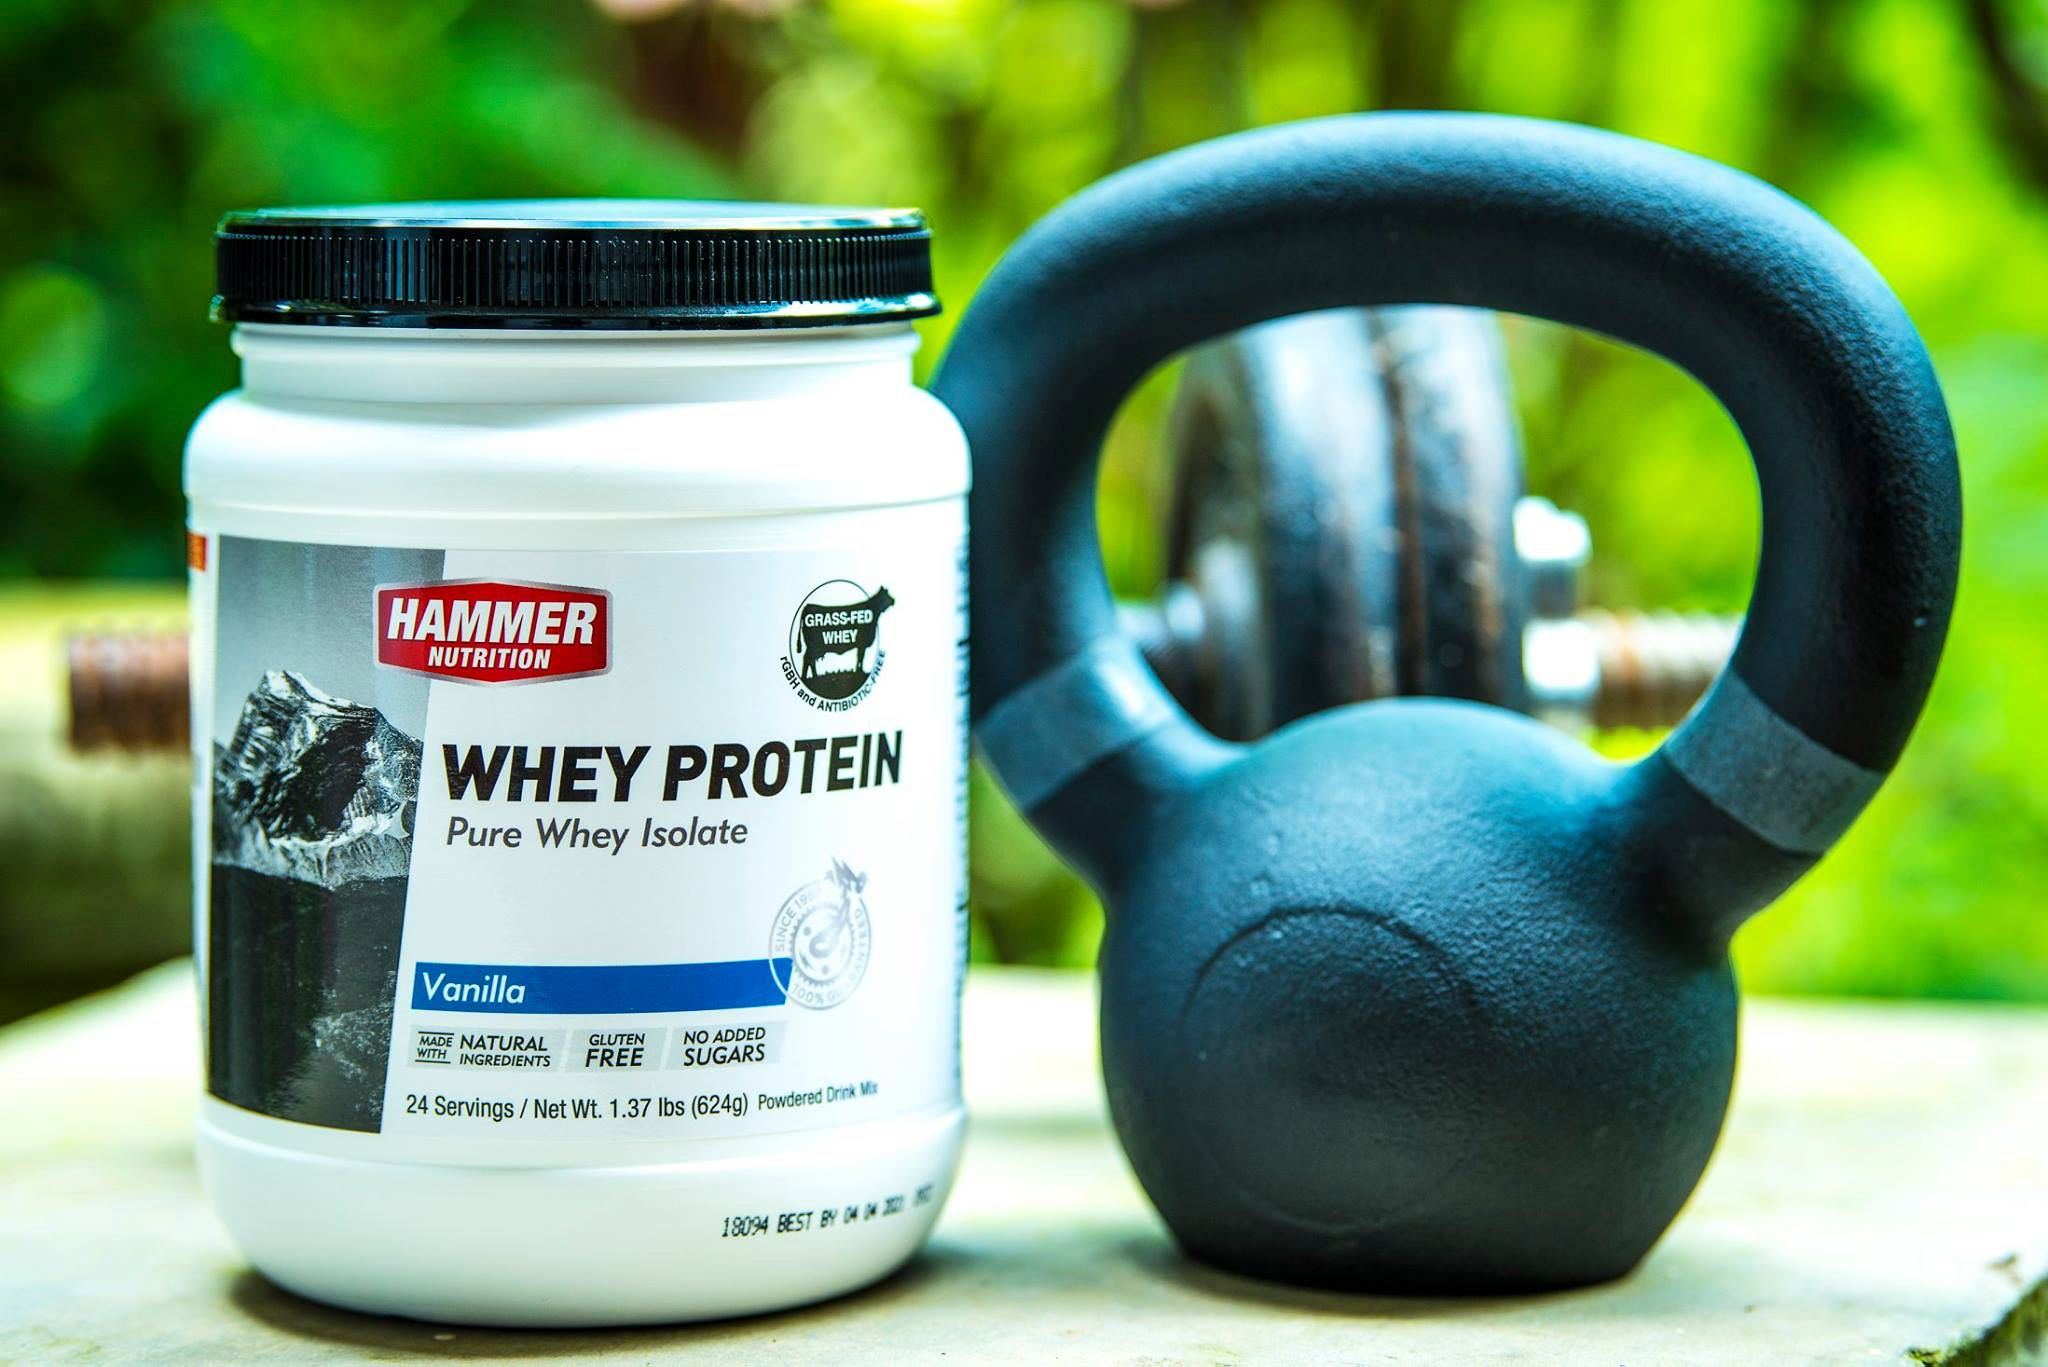 Hammer Whey Protein: A sokoldalú szuperétel!